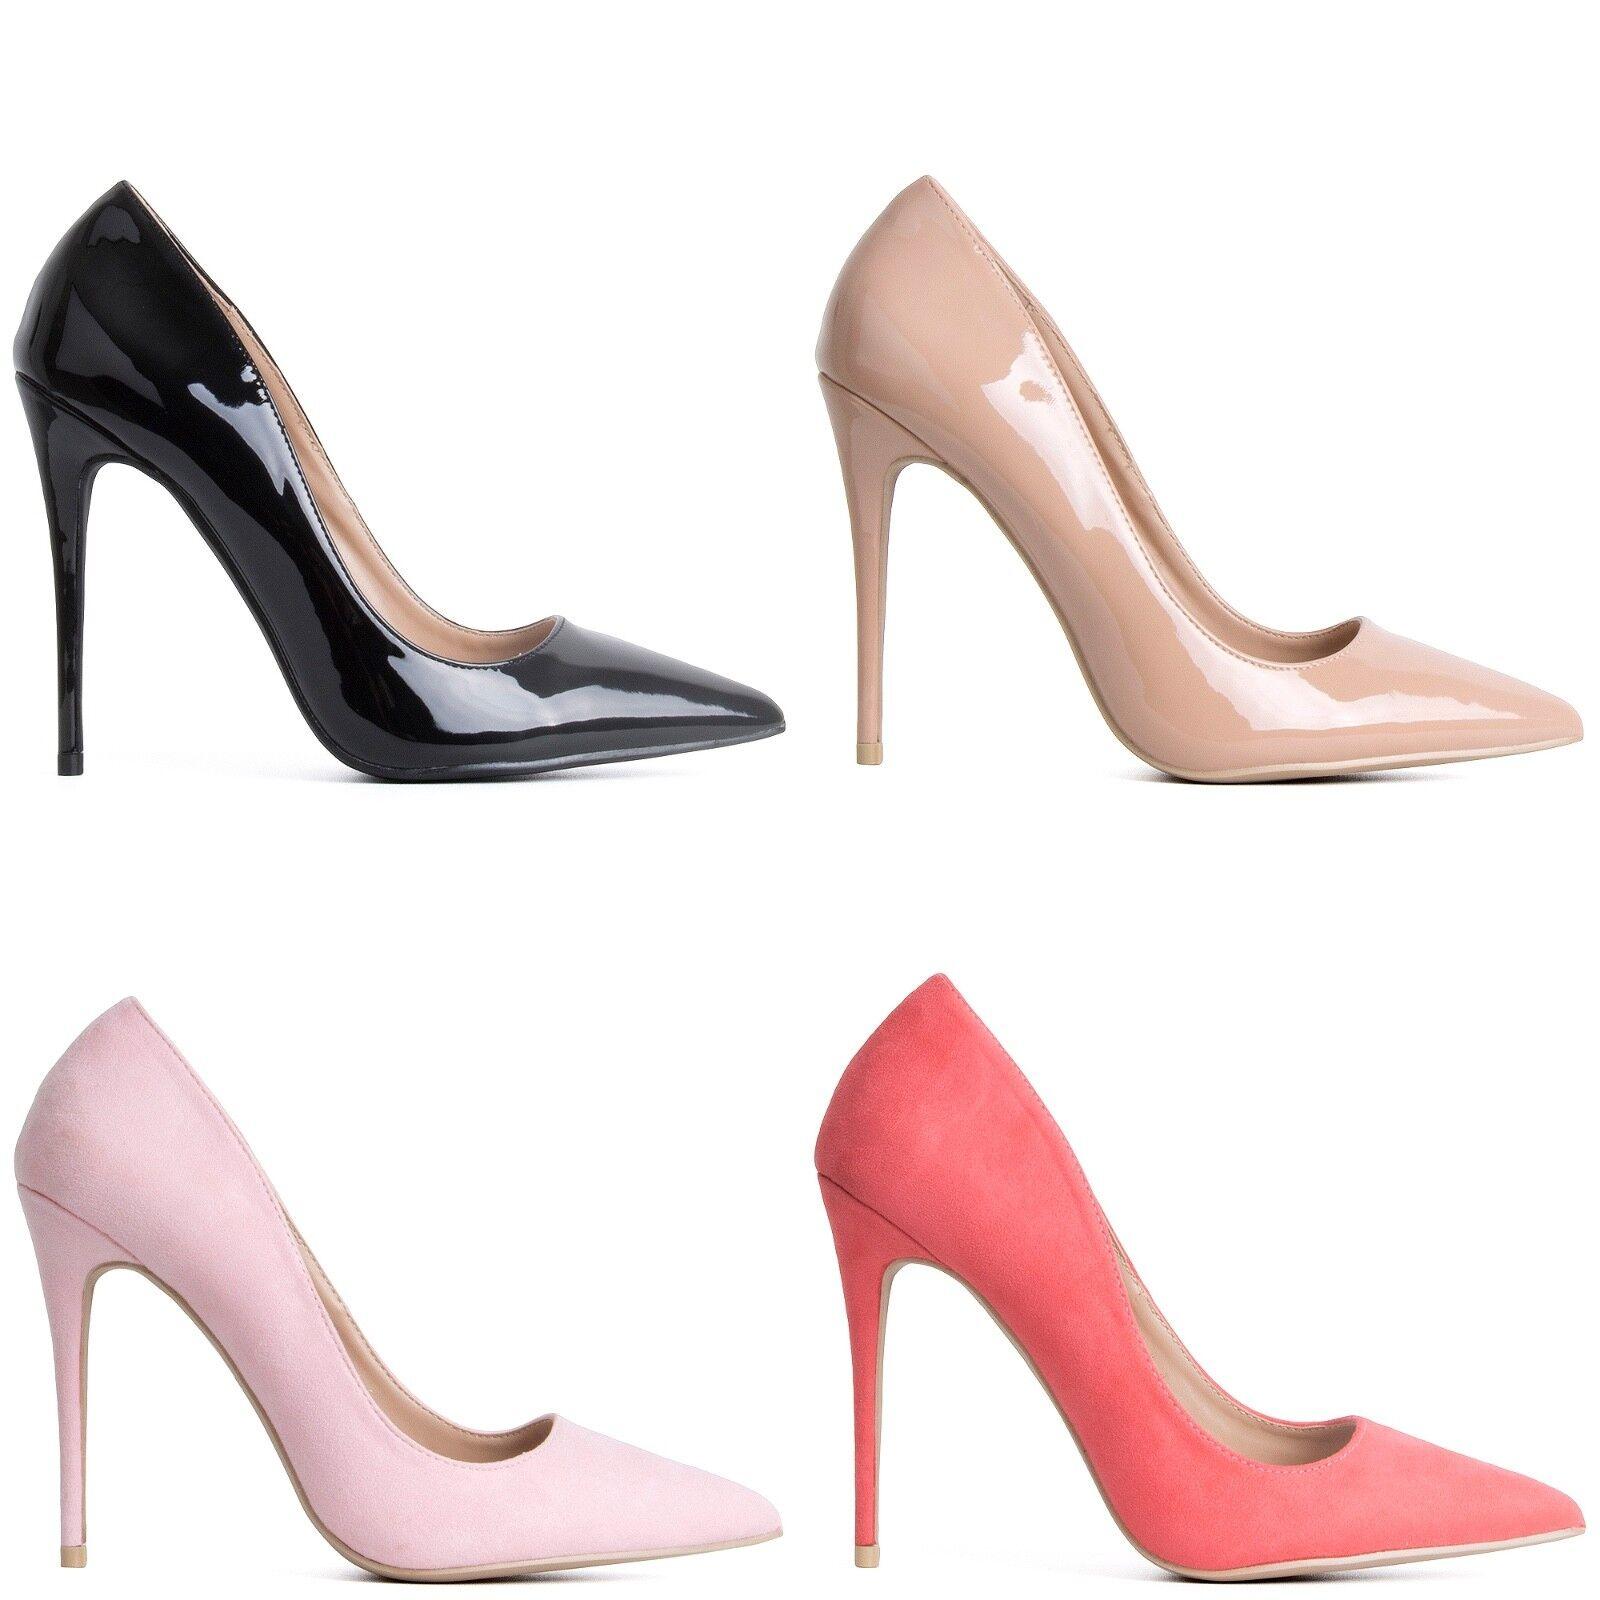 37becd30522 Womens Ladies Court Pointed Toe Heel High Heels Stiletto Easy Wear ...